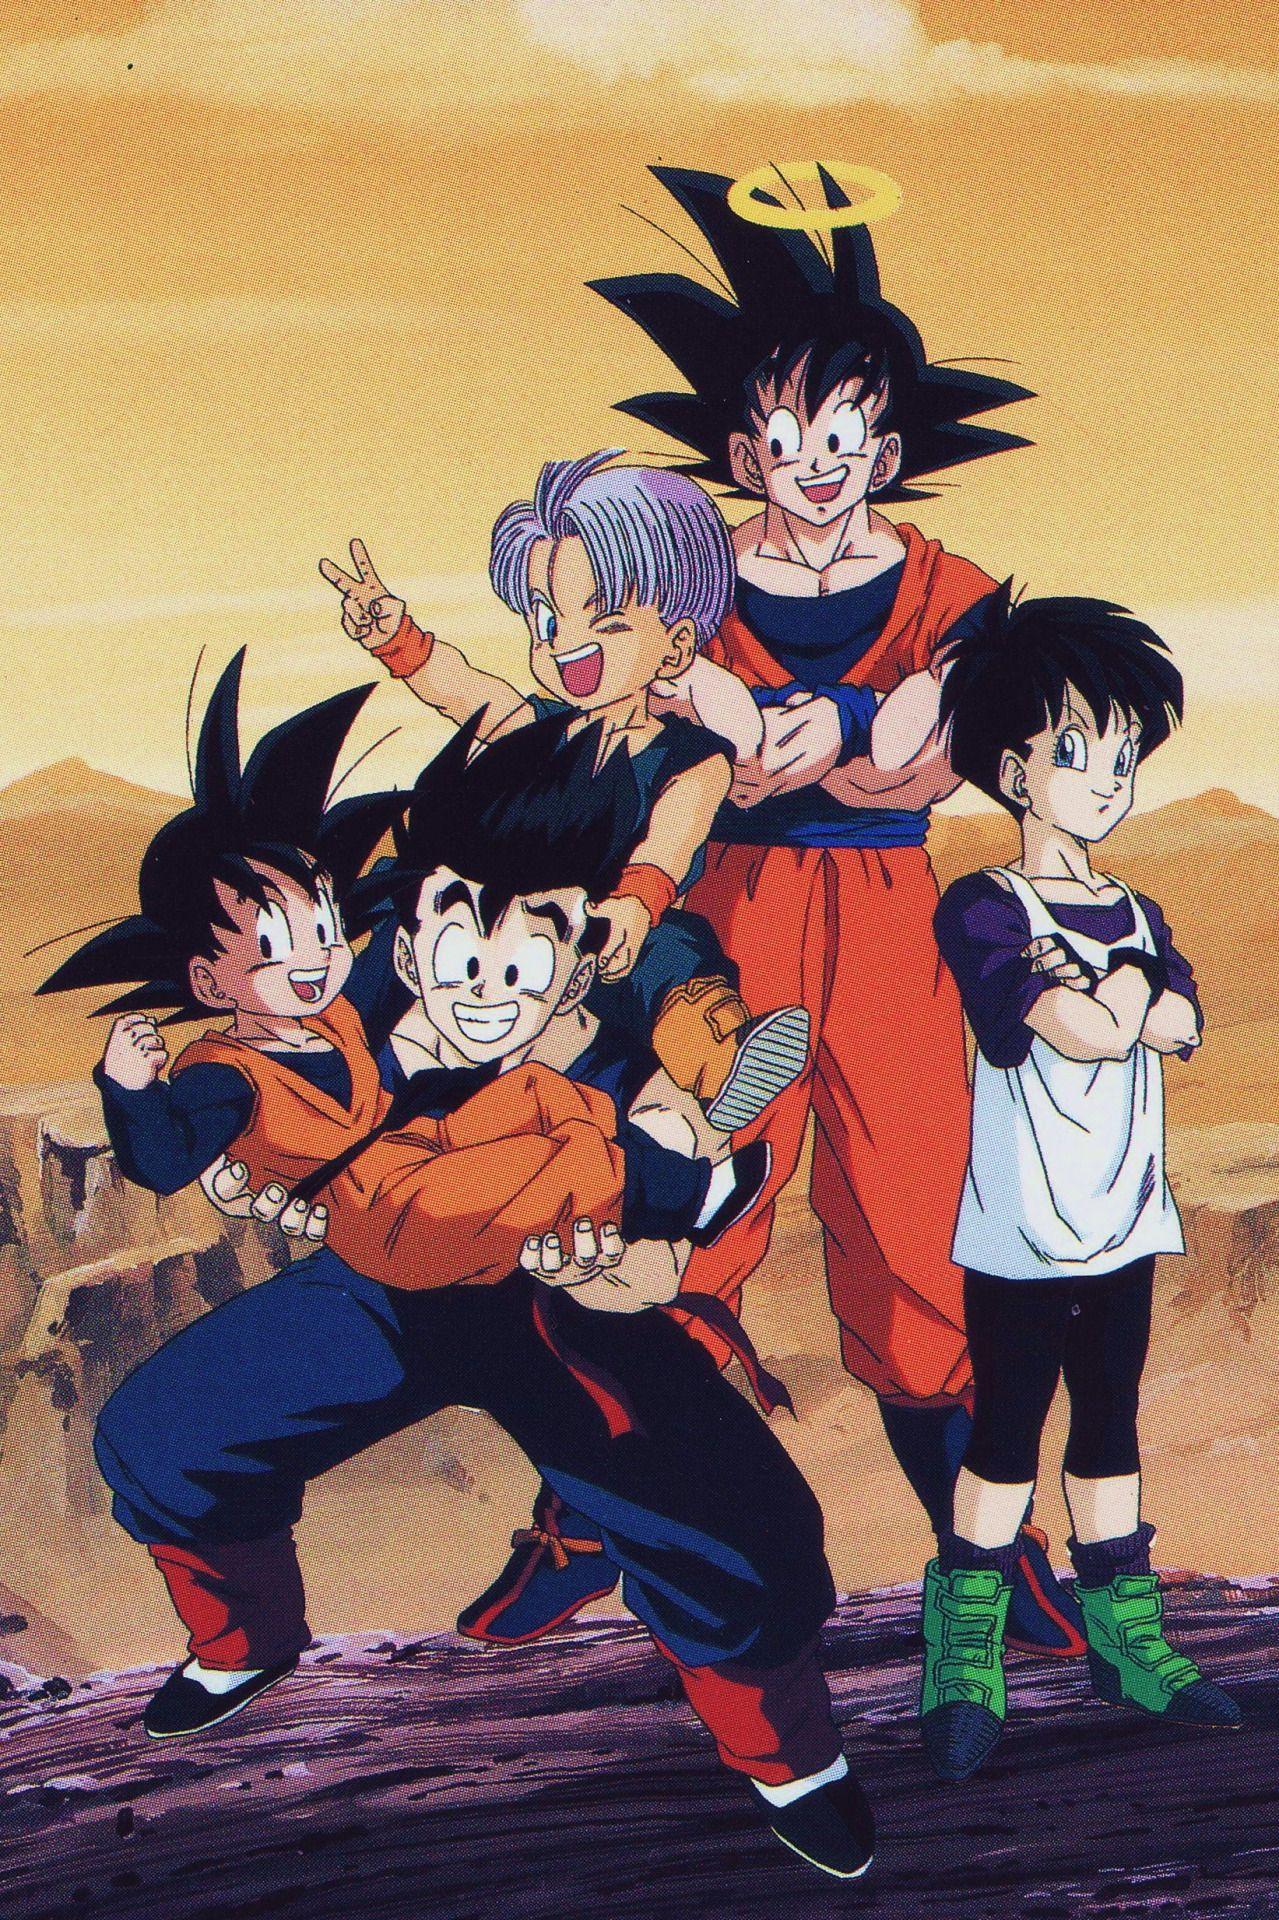 Goku Gohan Goten Trunks And Videl